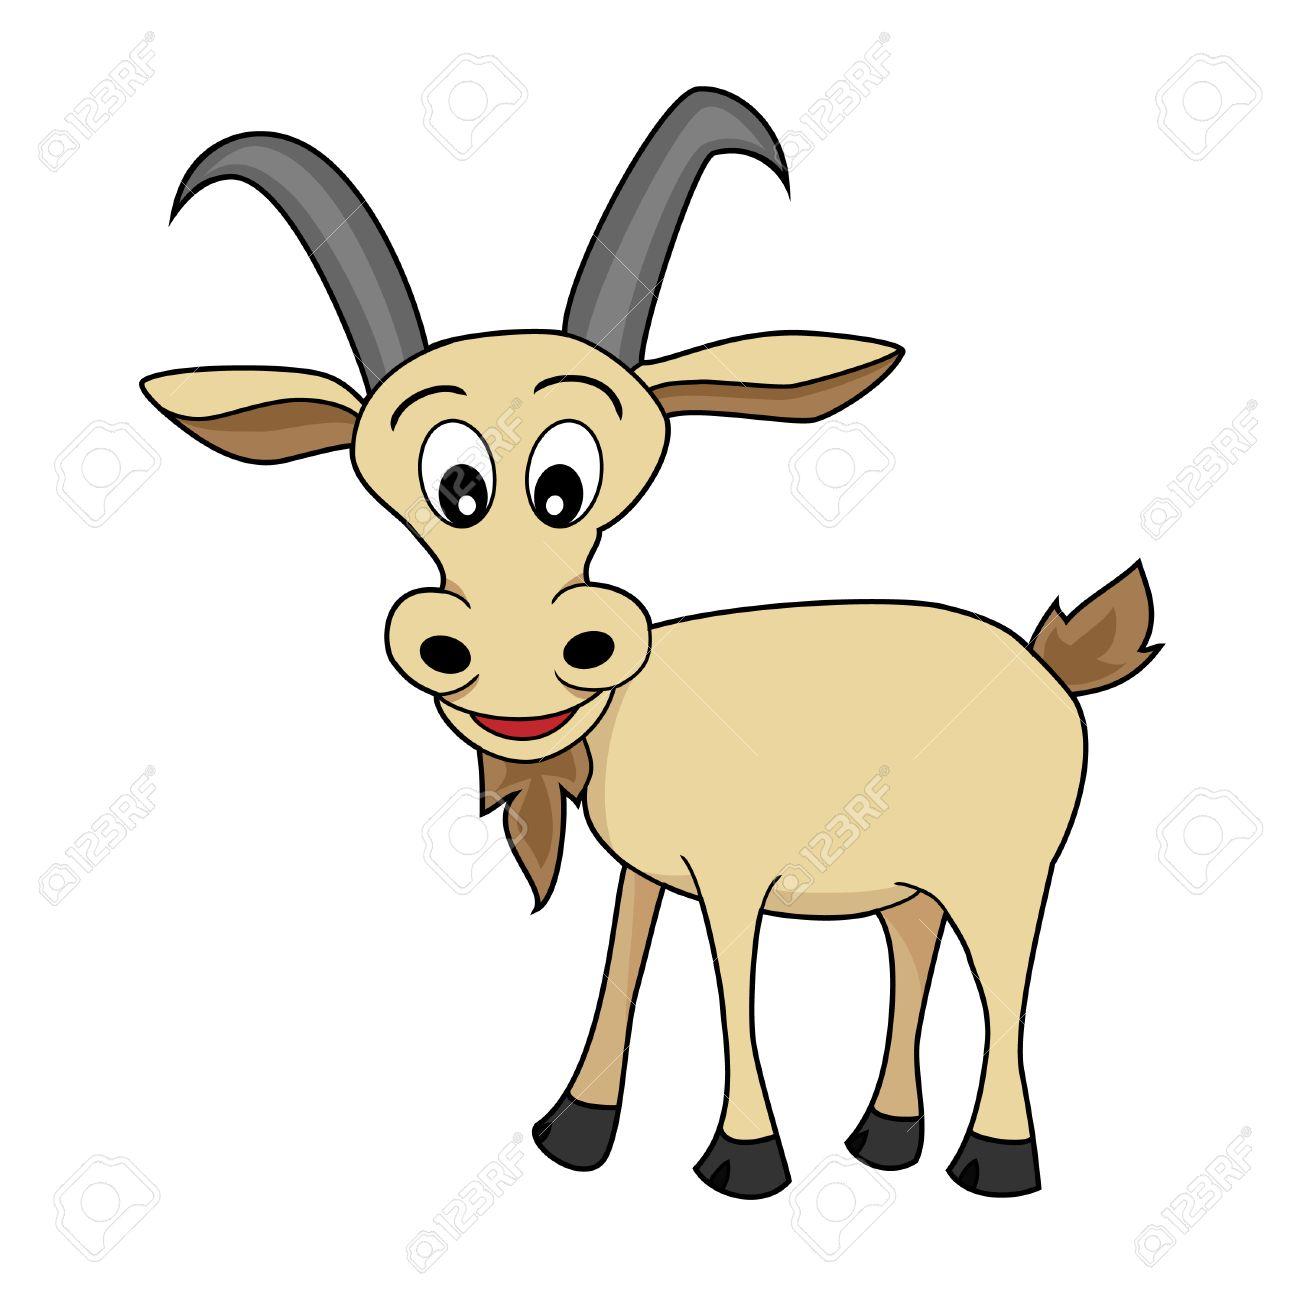 Cartoon Goat Wallpaper Cartoon Goat Animal